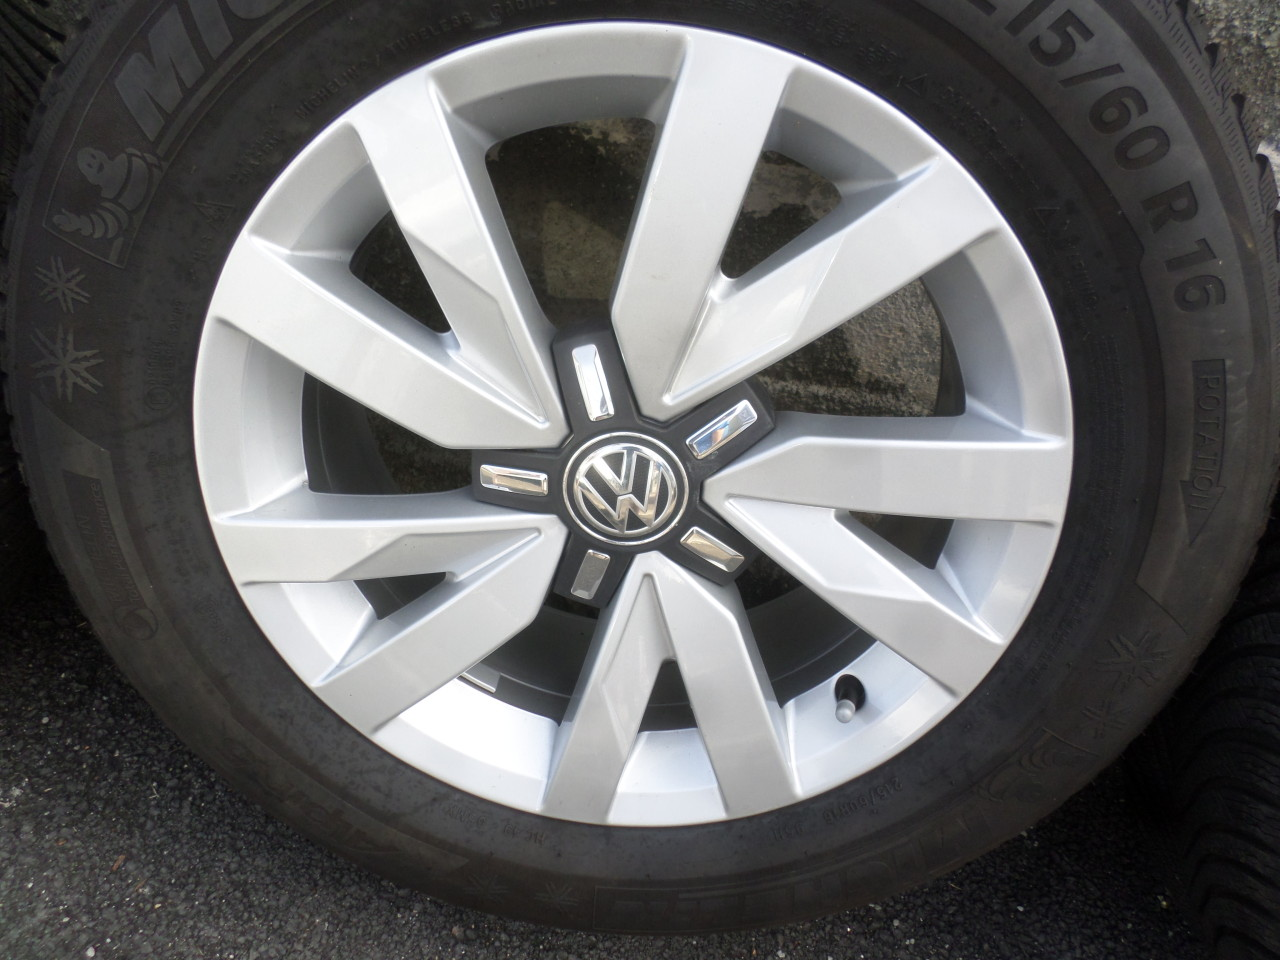 Jante VW Passat b8 Aragon 215 60 16 iarna Michelin Alpin 5 dot (4416)